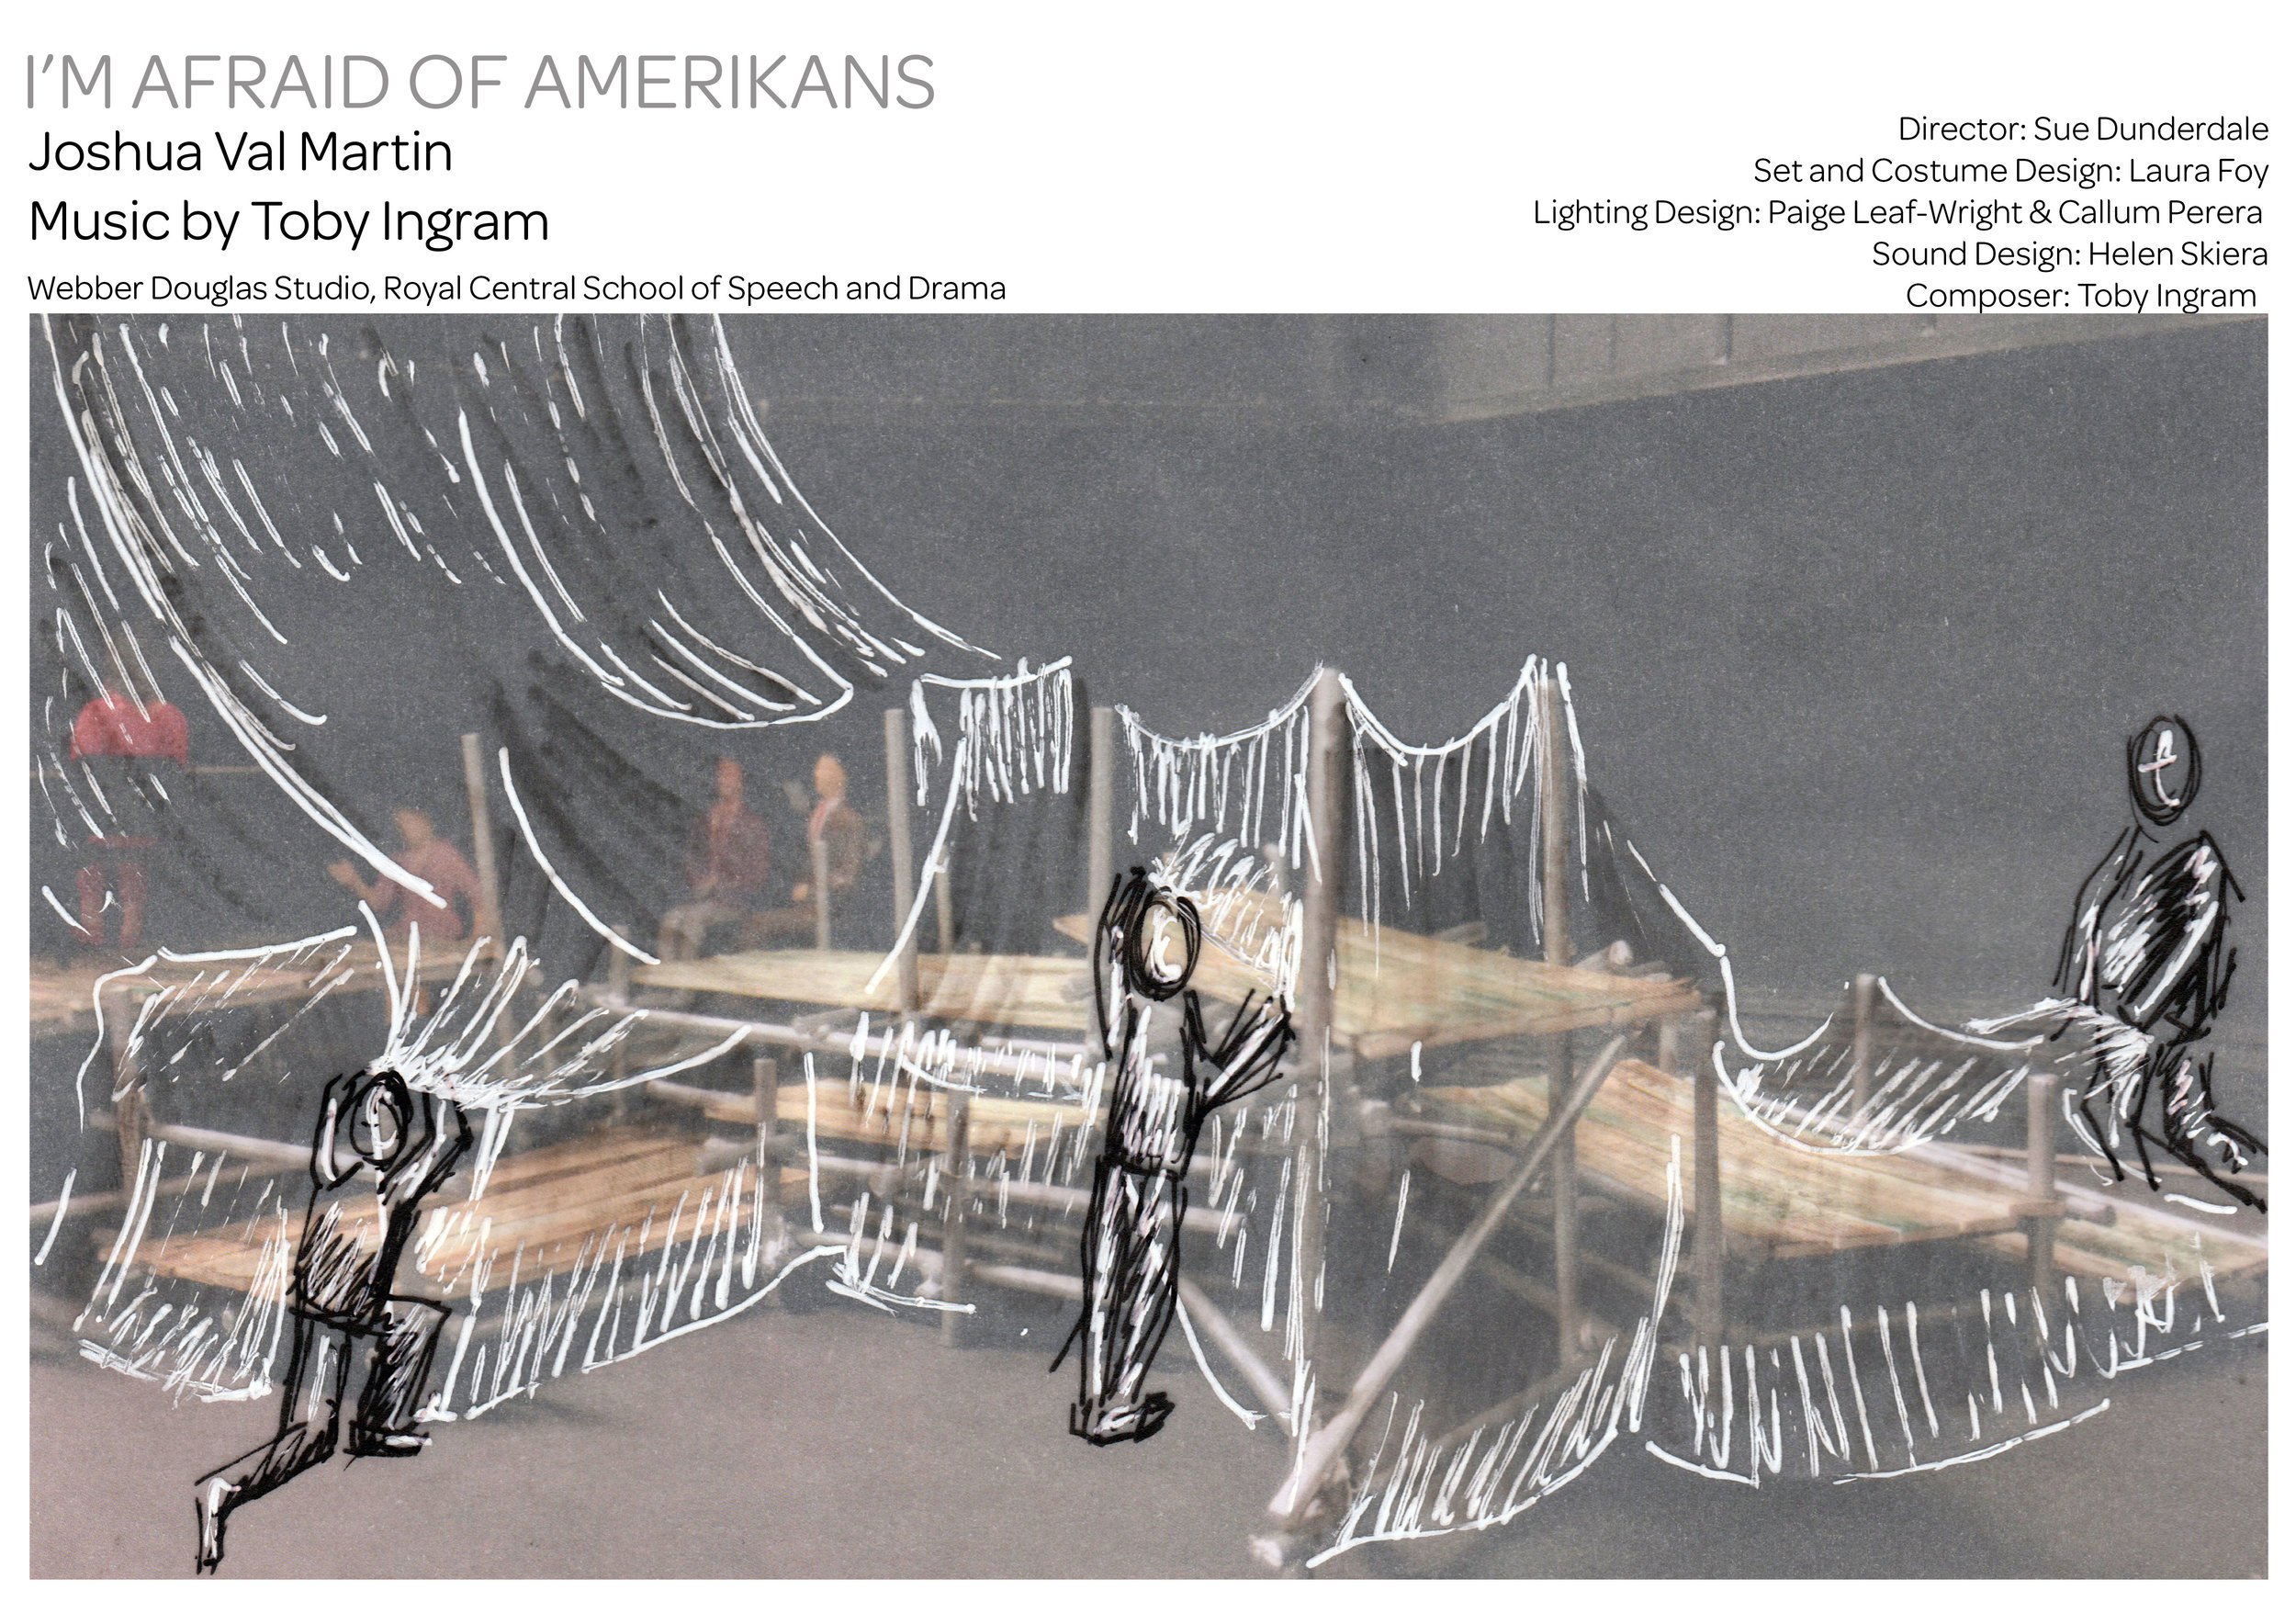 Amerikans-title.jpg